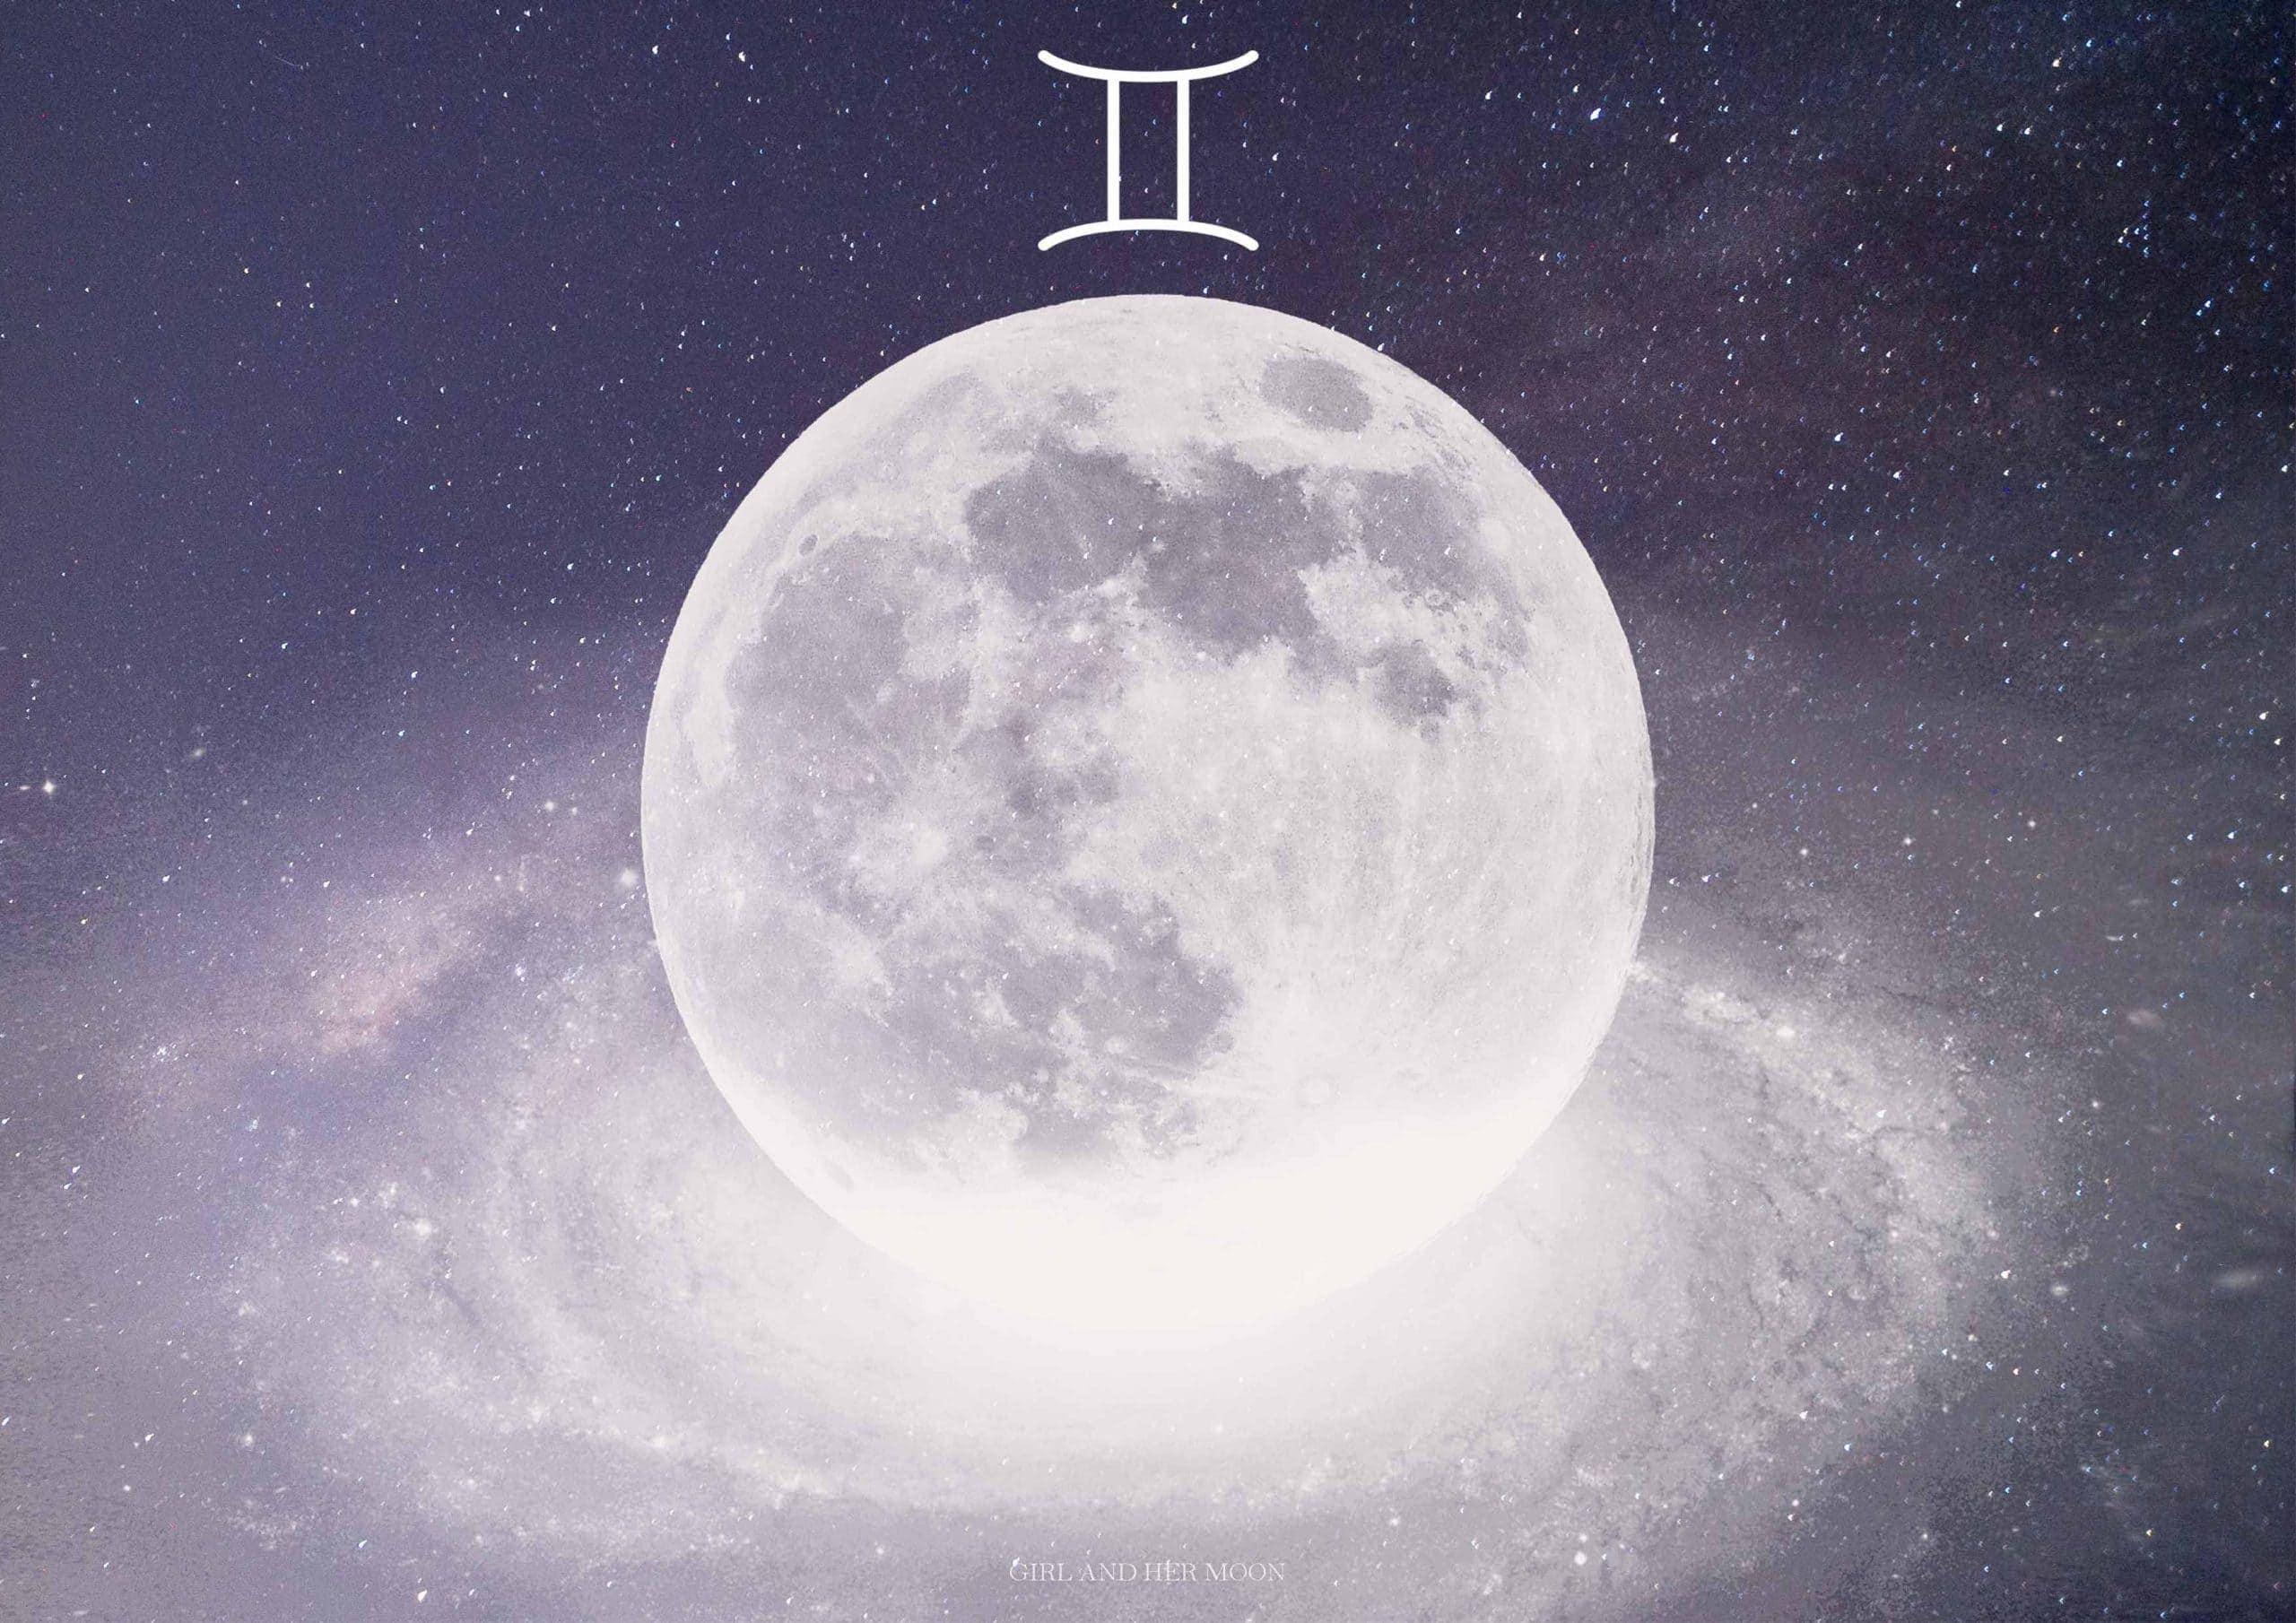 Gemini New Moon May 2020 - Girl and Her Moon